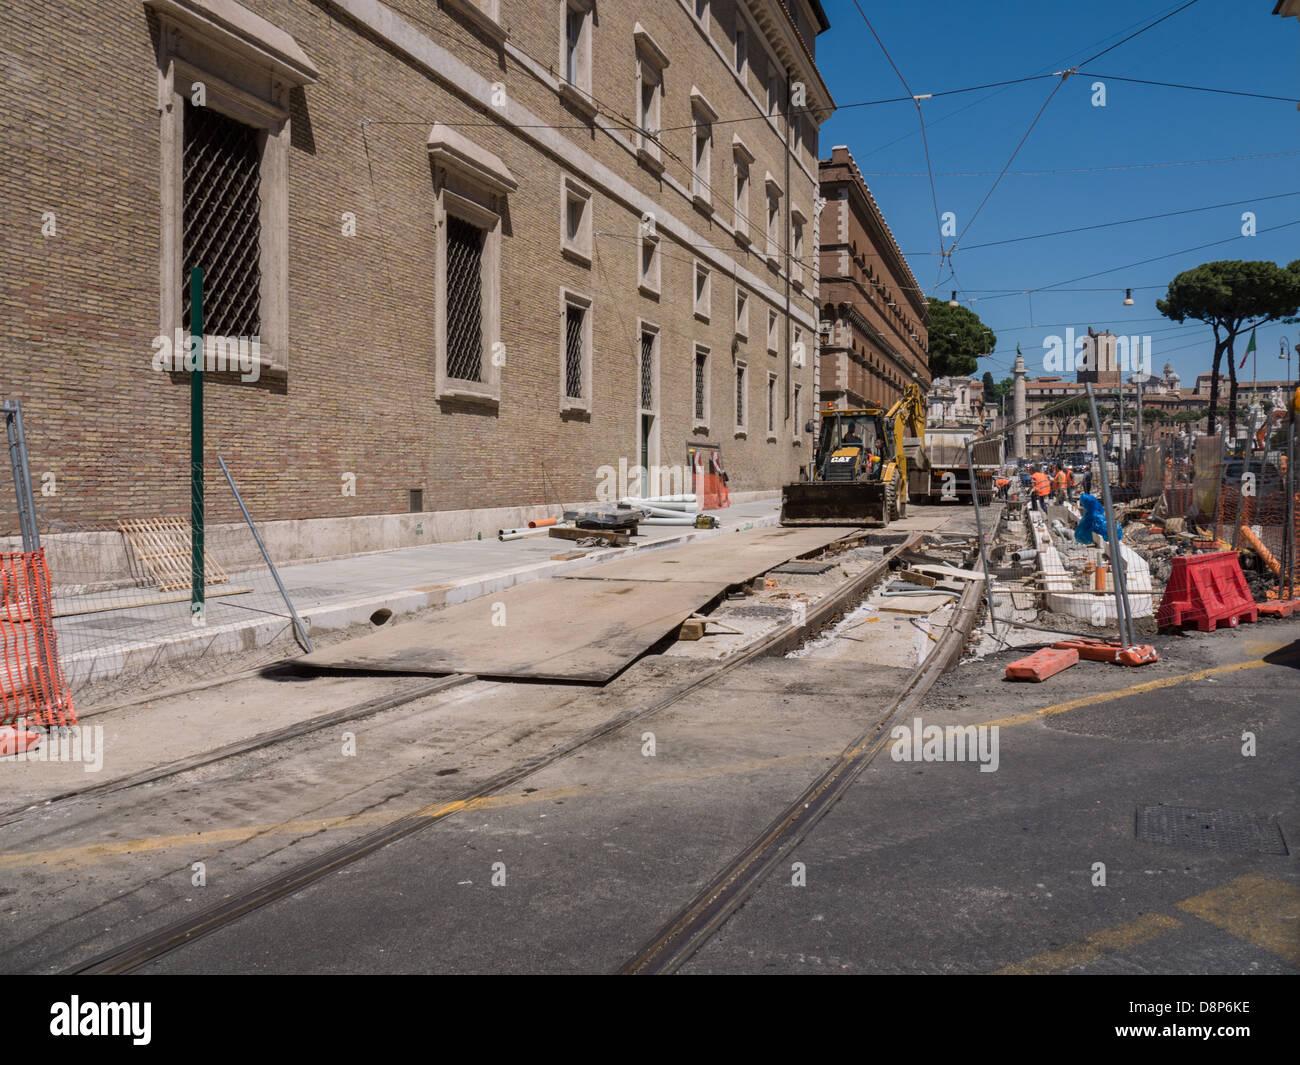 work in progress in the city, Rome Italy - Stock Image